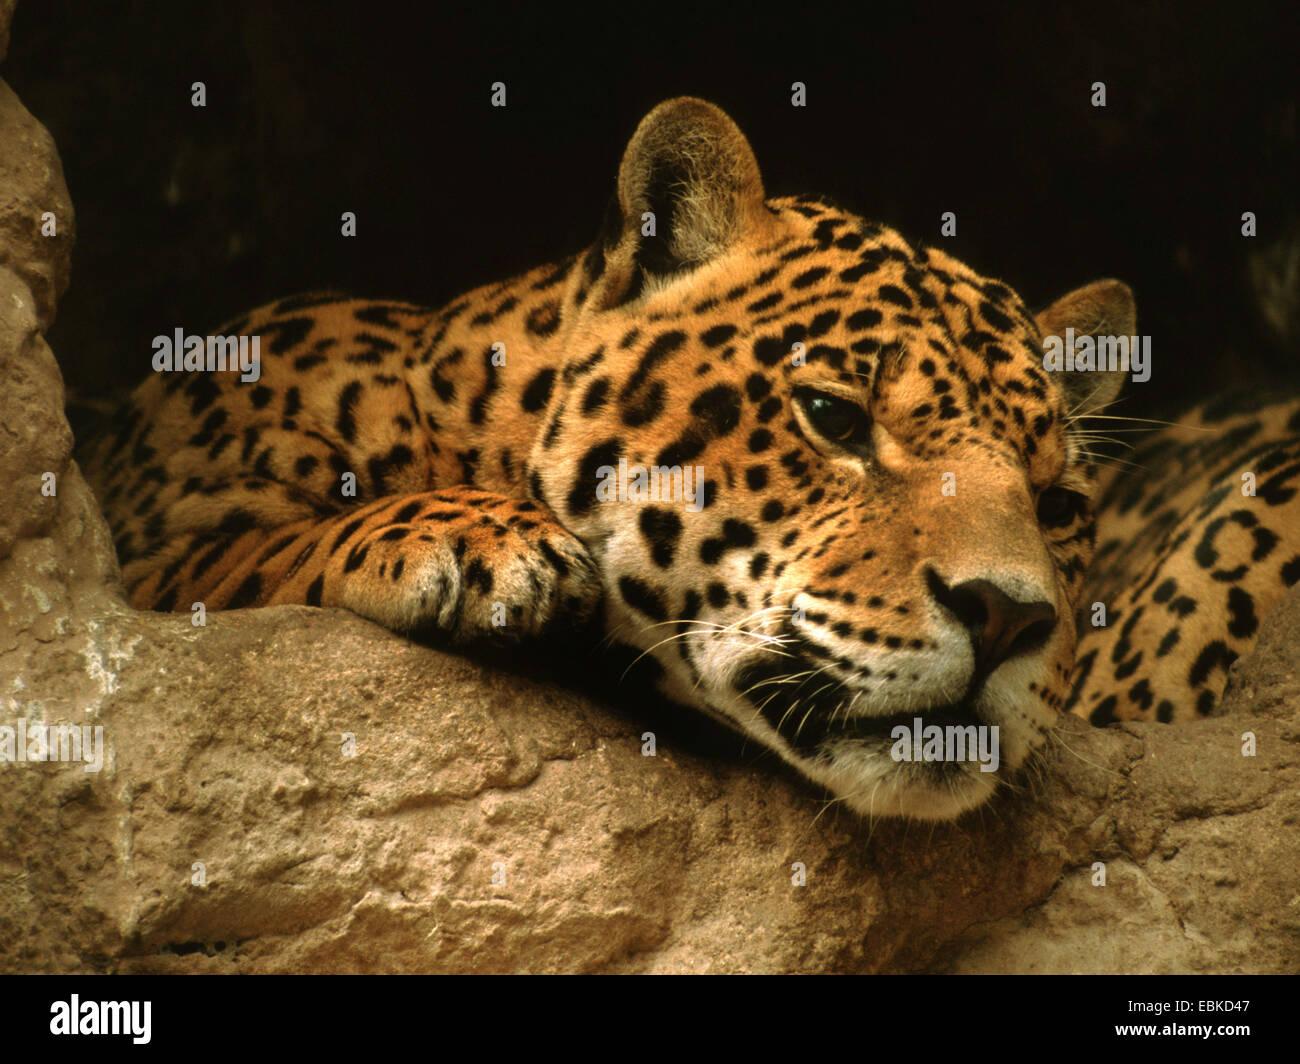 jaguar (Panthera onca), portrait - Stock Image